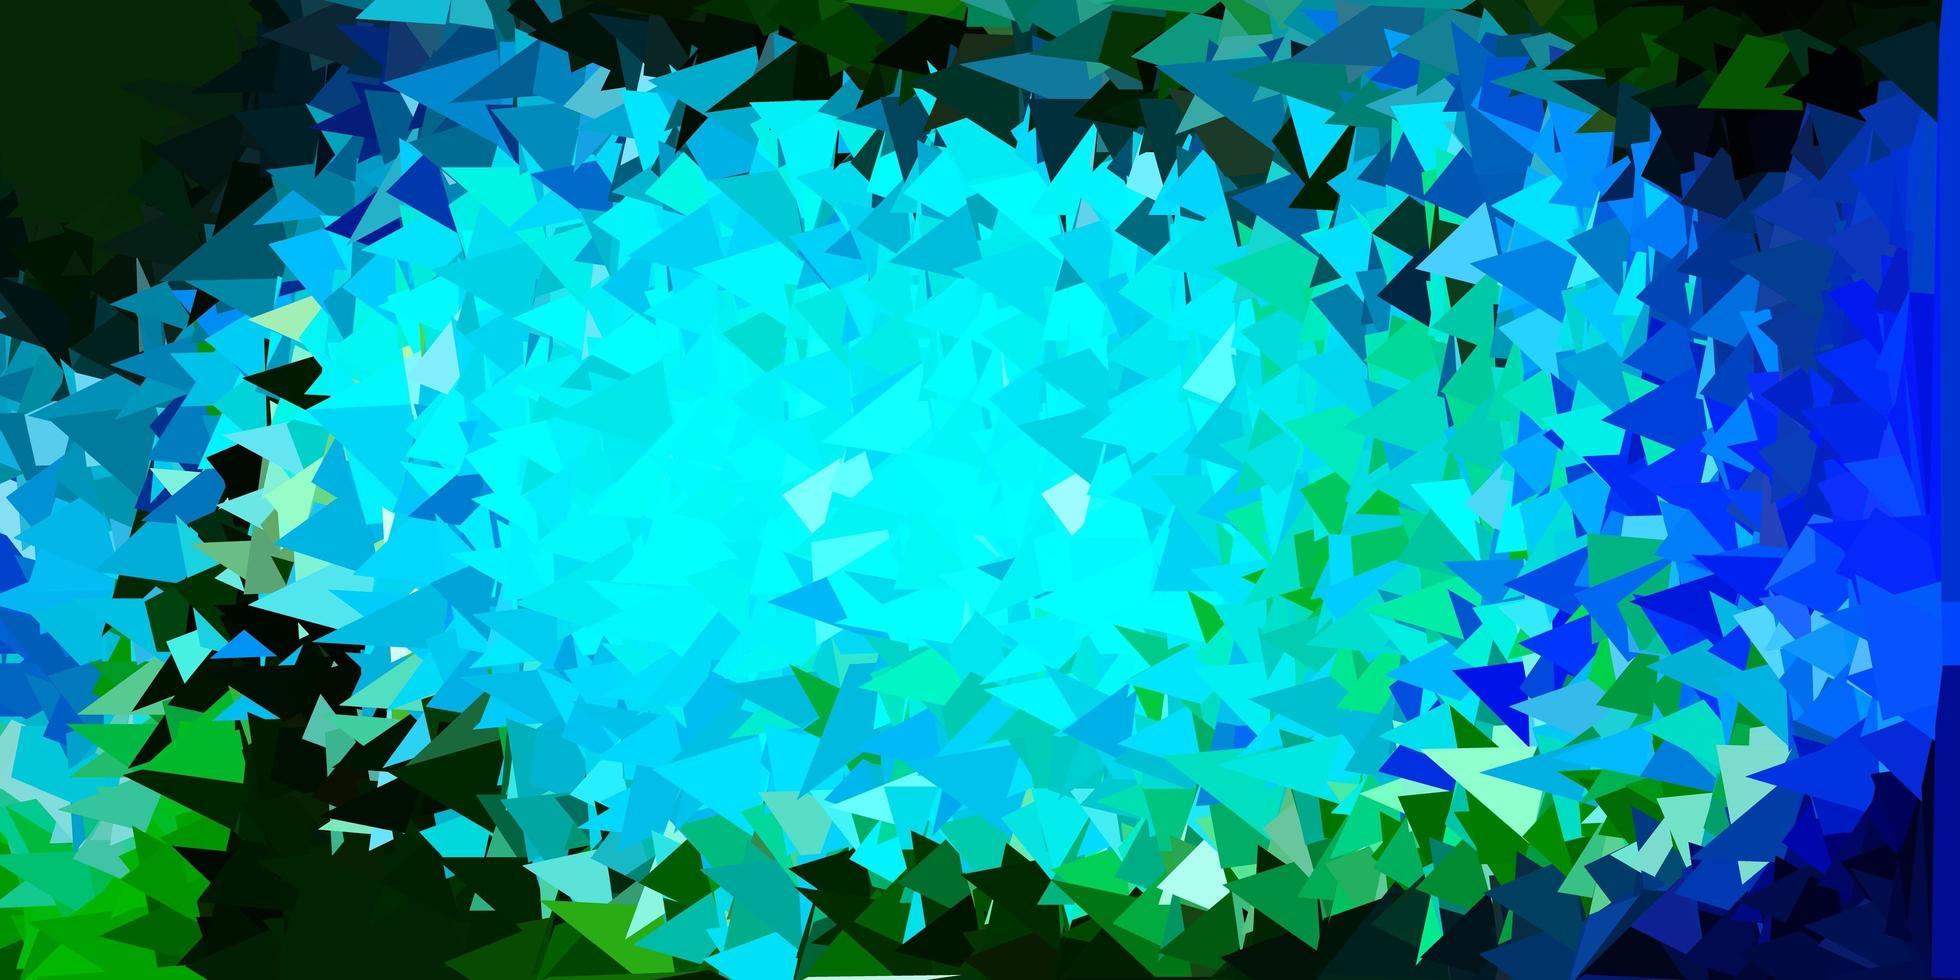 ljusblå, grön vektor triangel mosaik bakgrund.